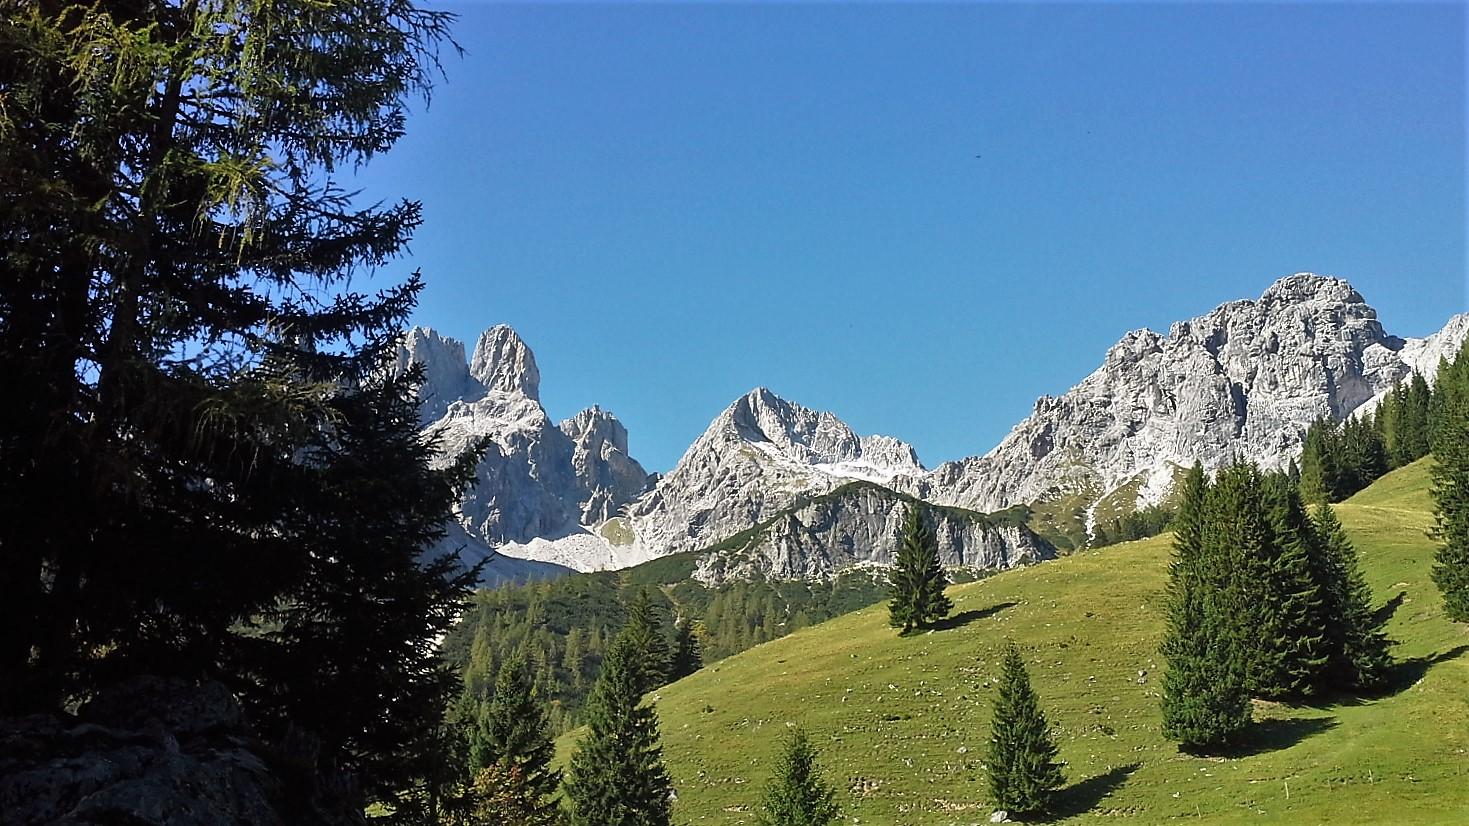 montagne del salisburghese